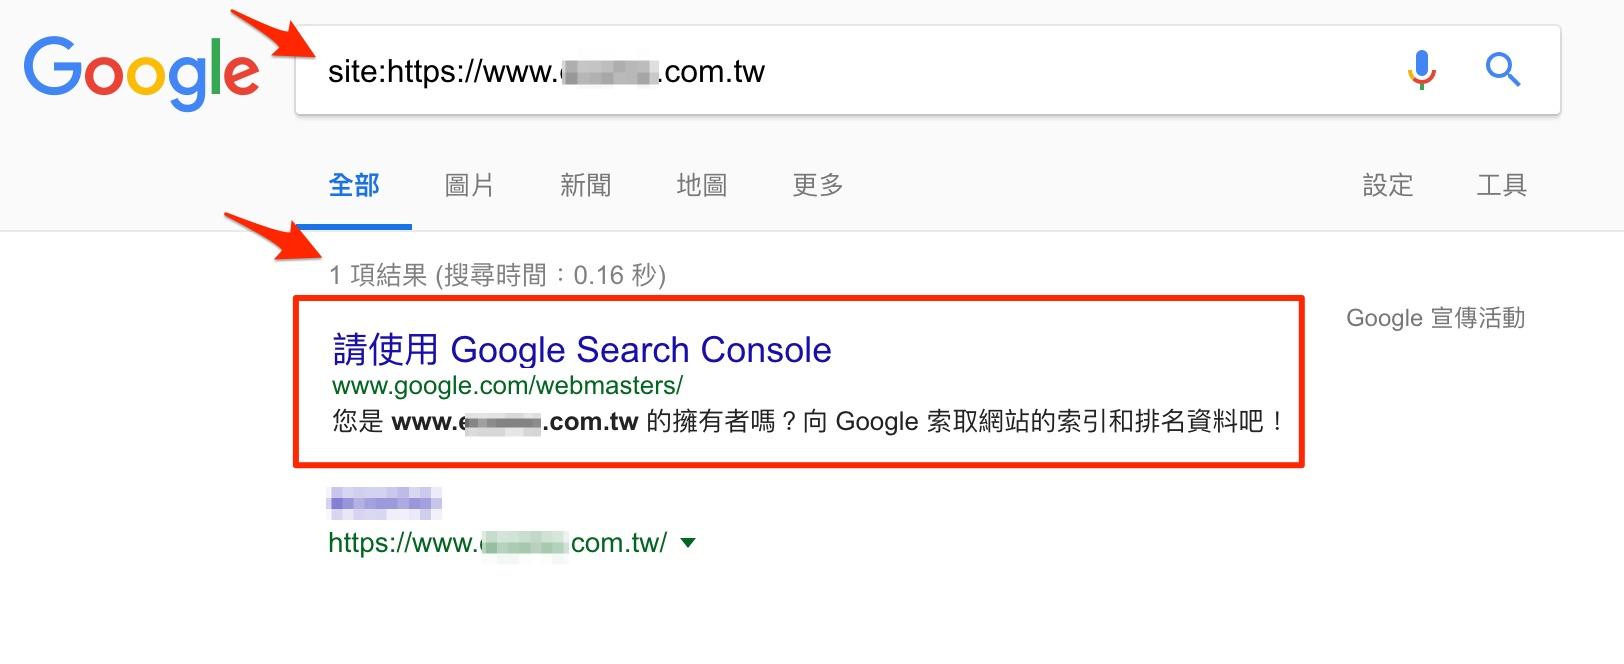 Google 無法收錄